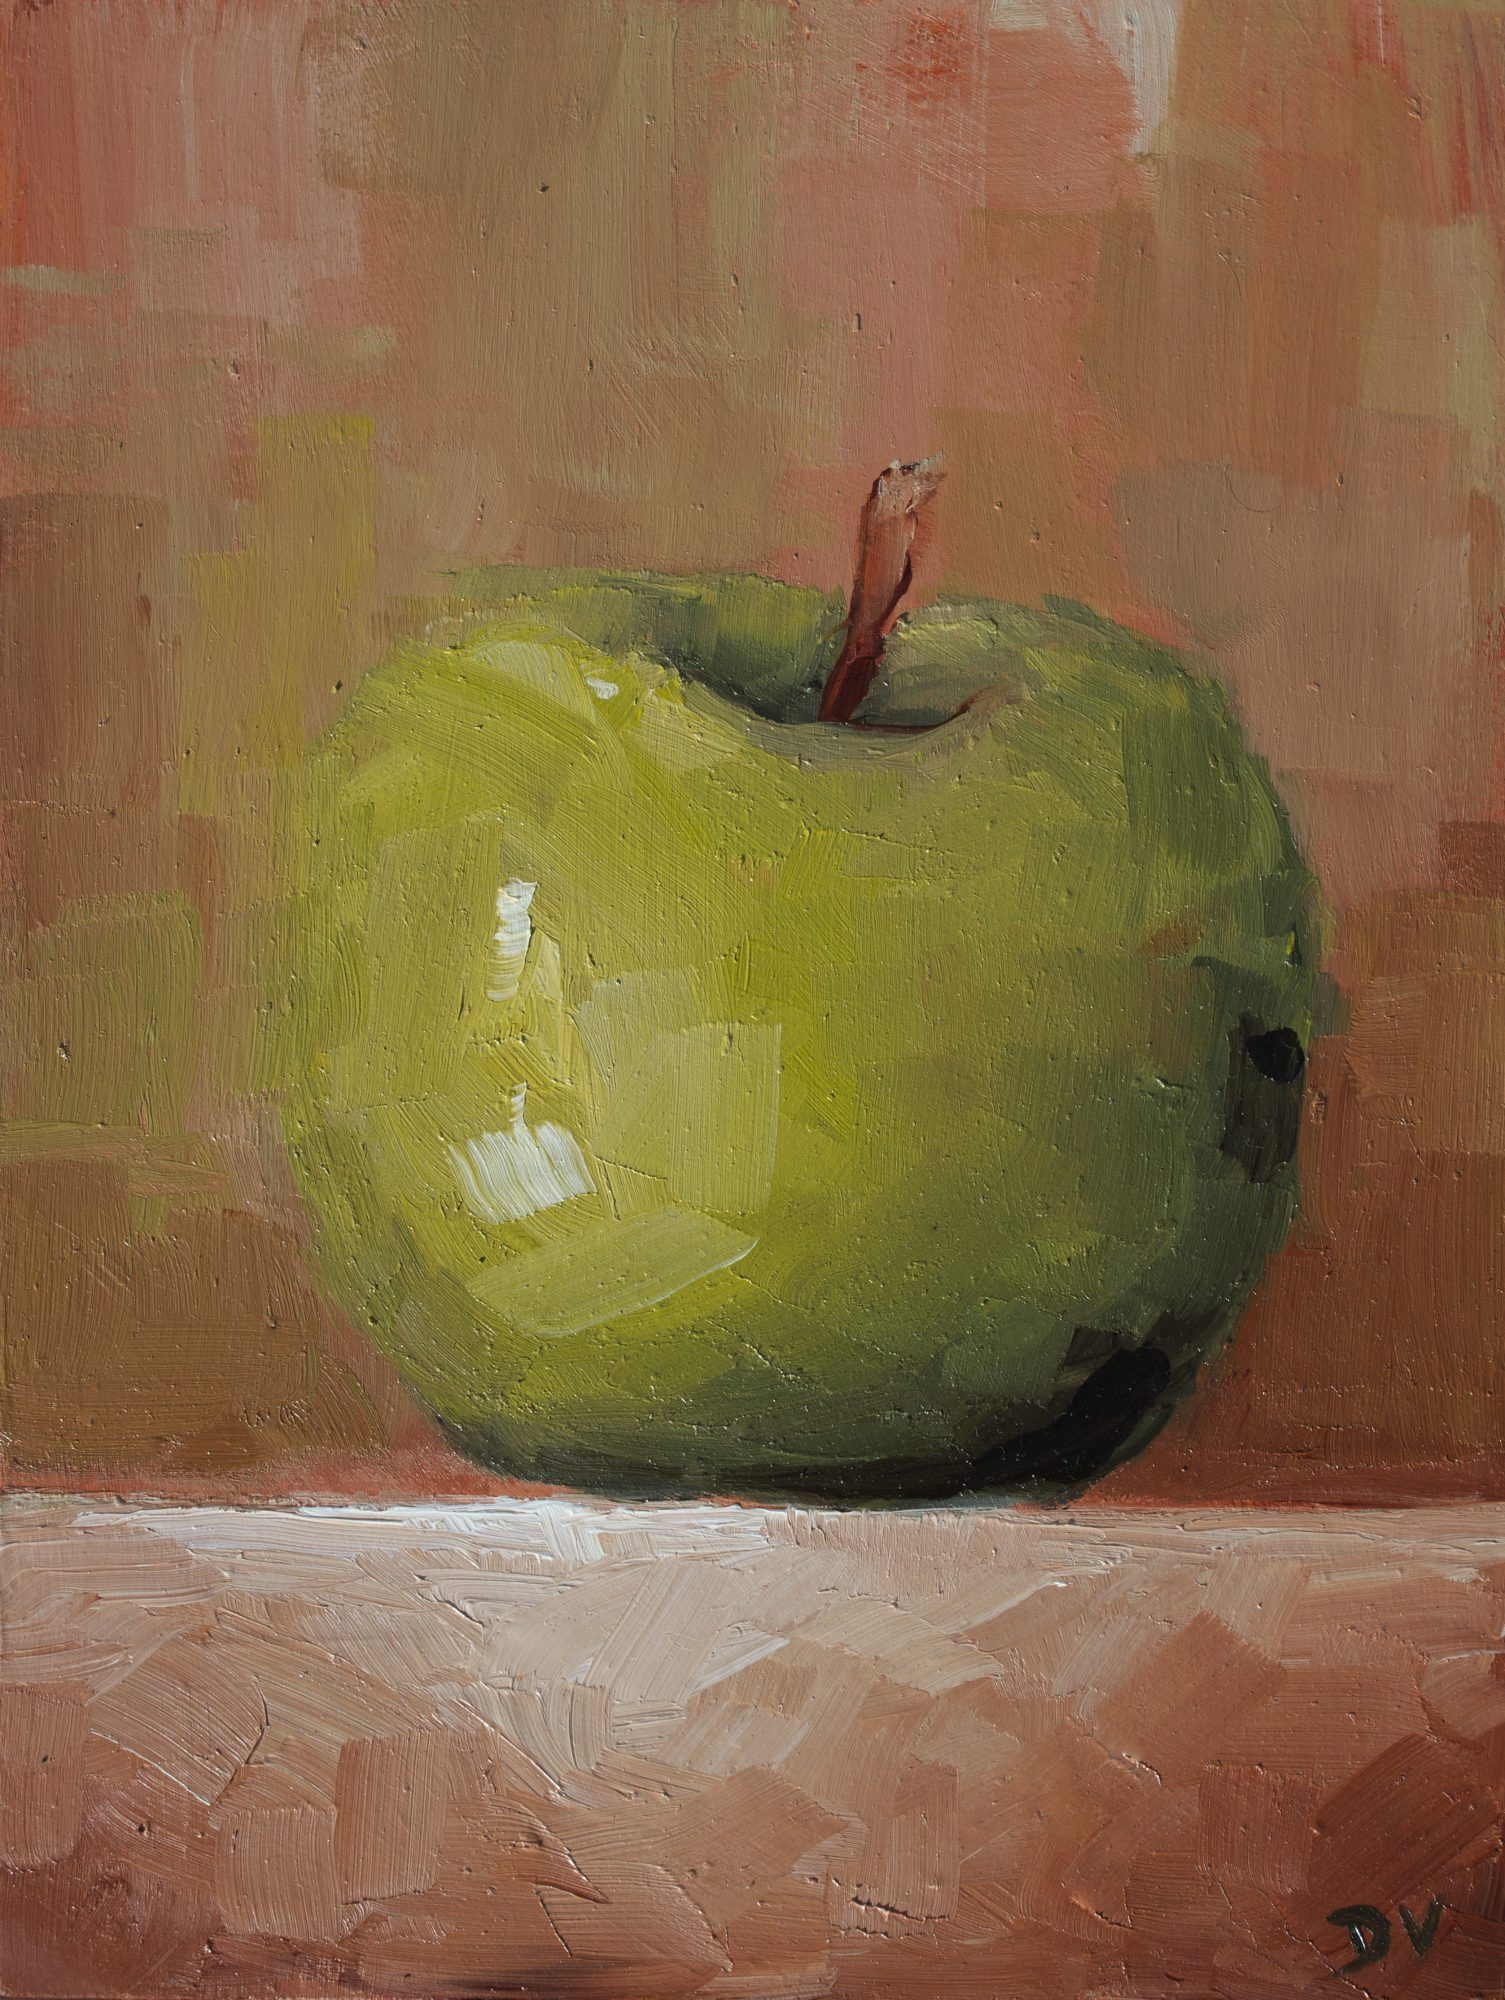 Granny Smith Apple 2a